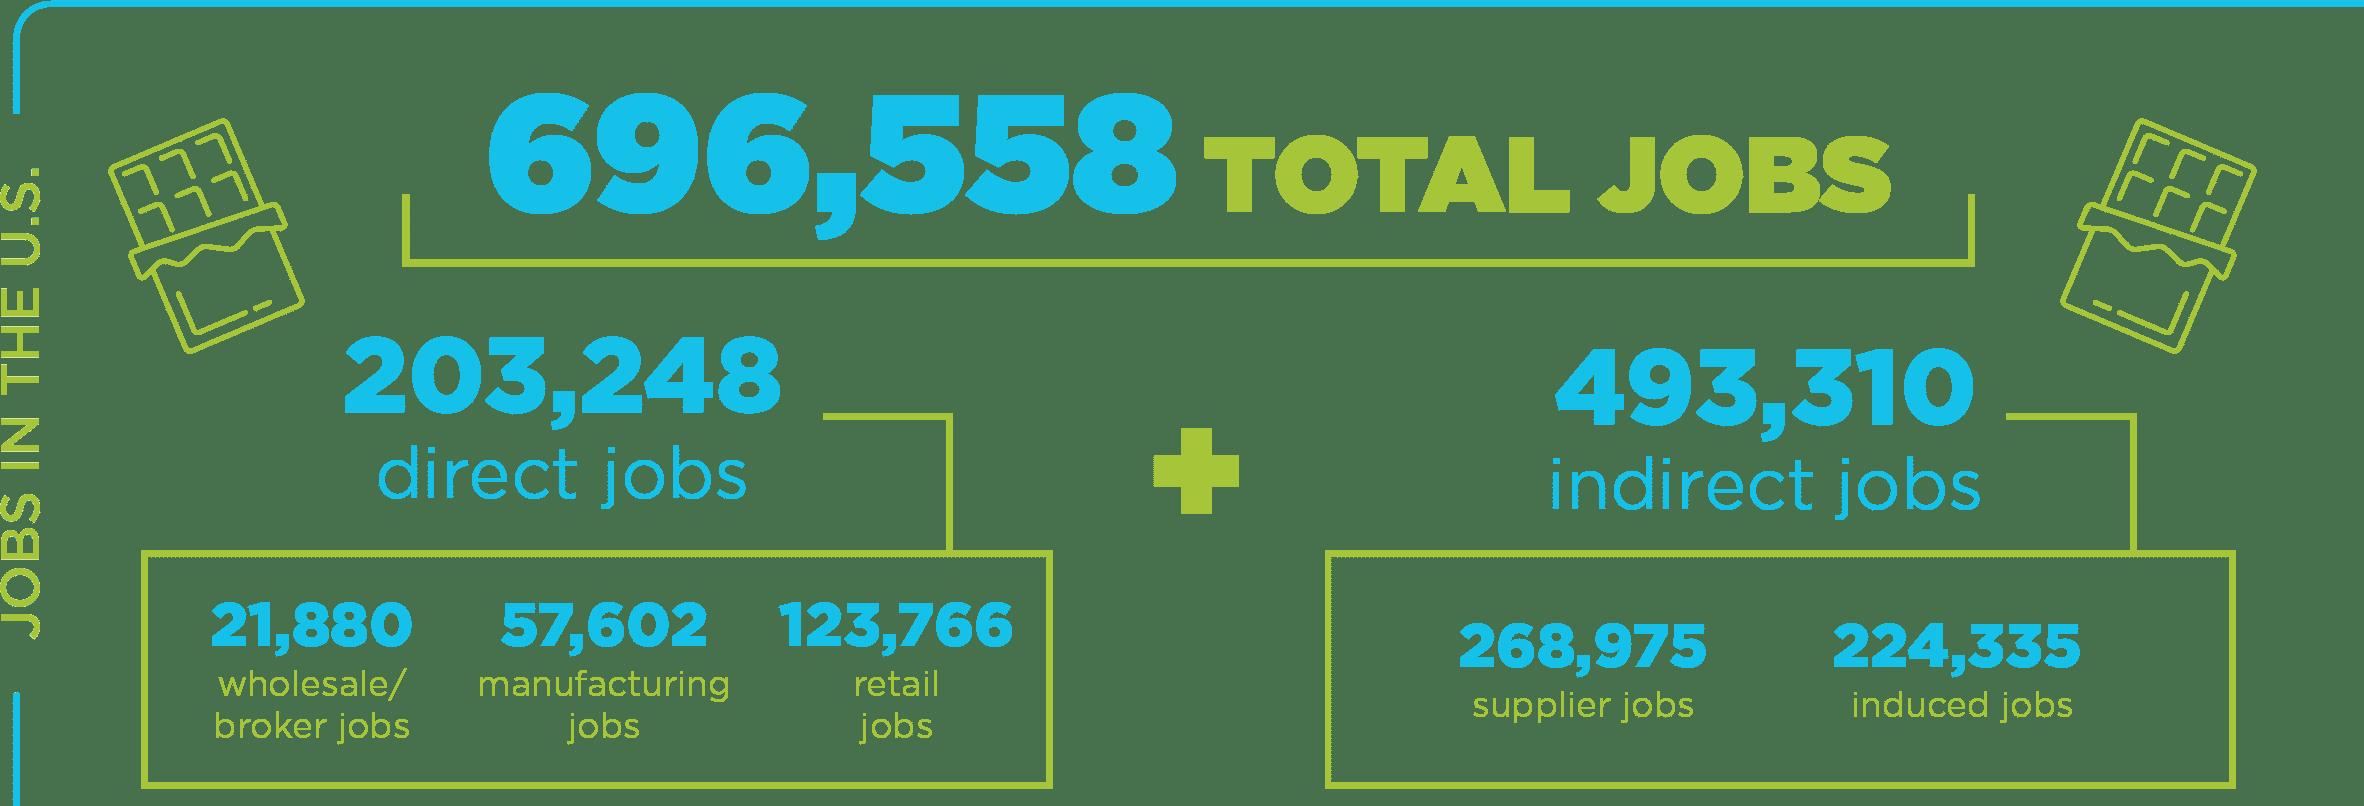 696,558 Total Jobs: 203,248 direct jobs + 493,310 indirect jobs